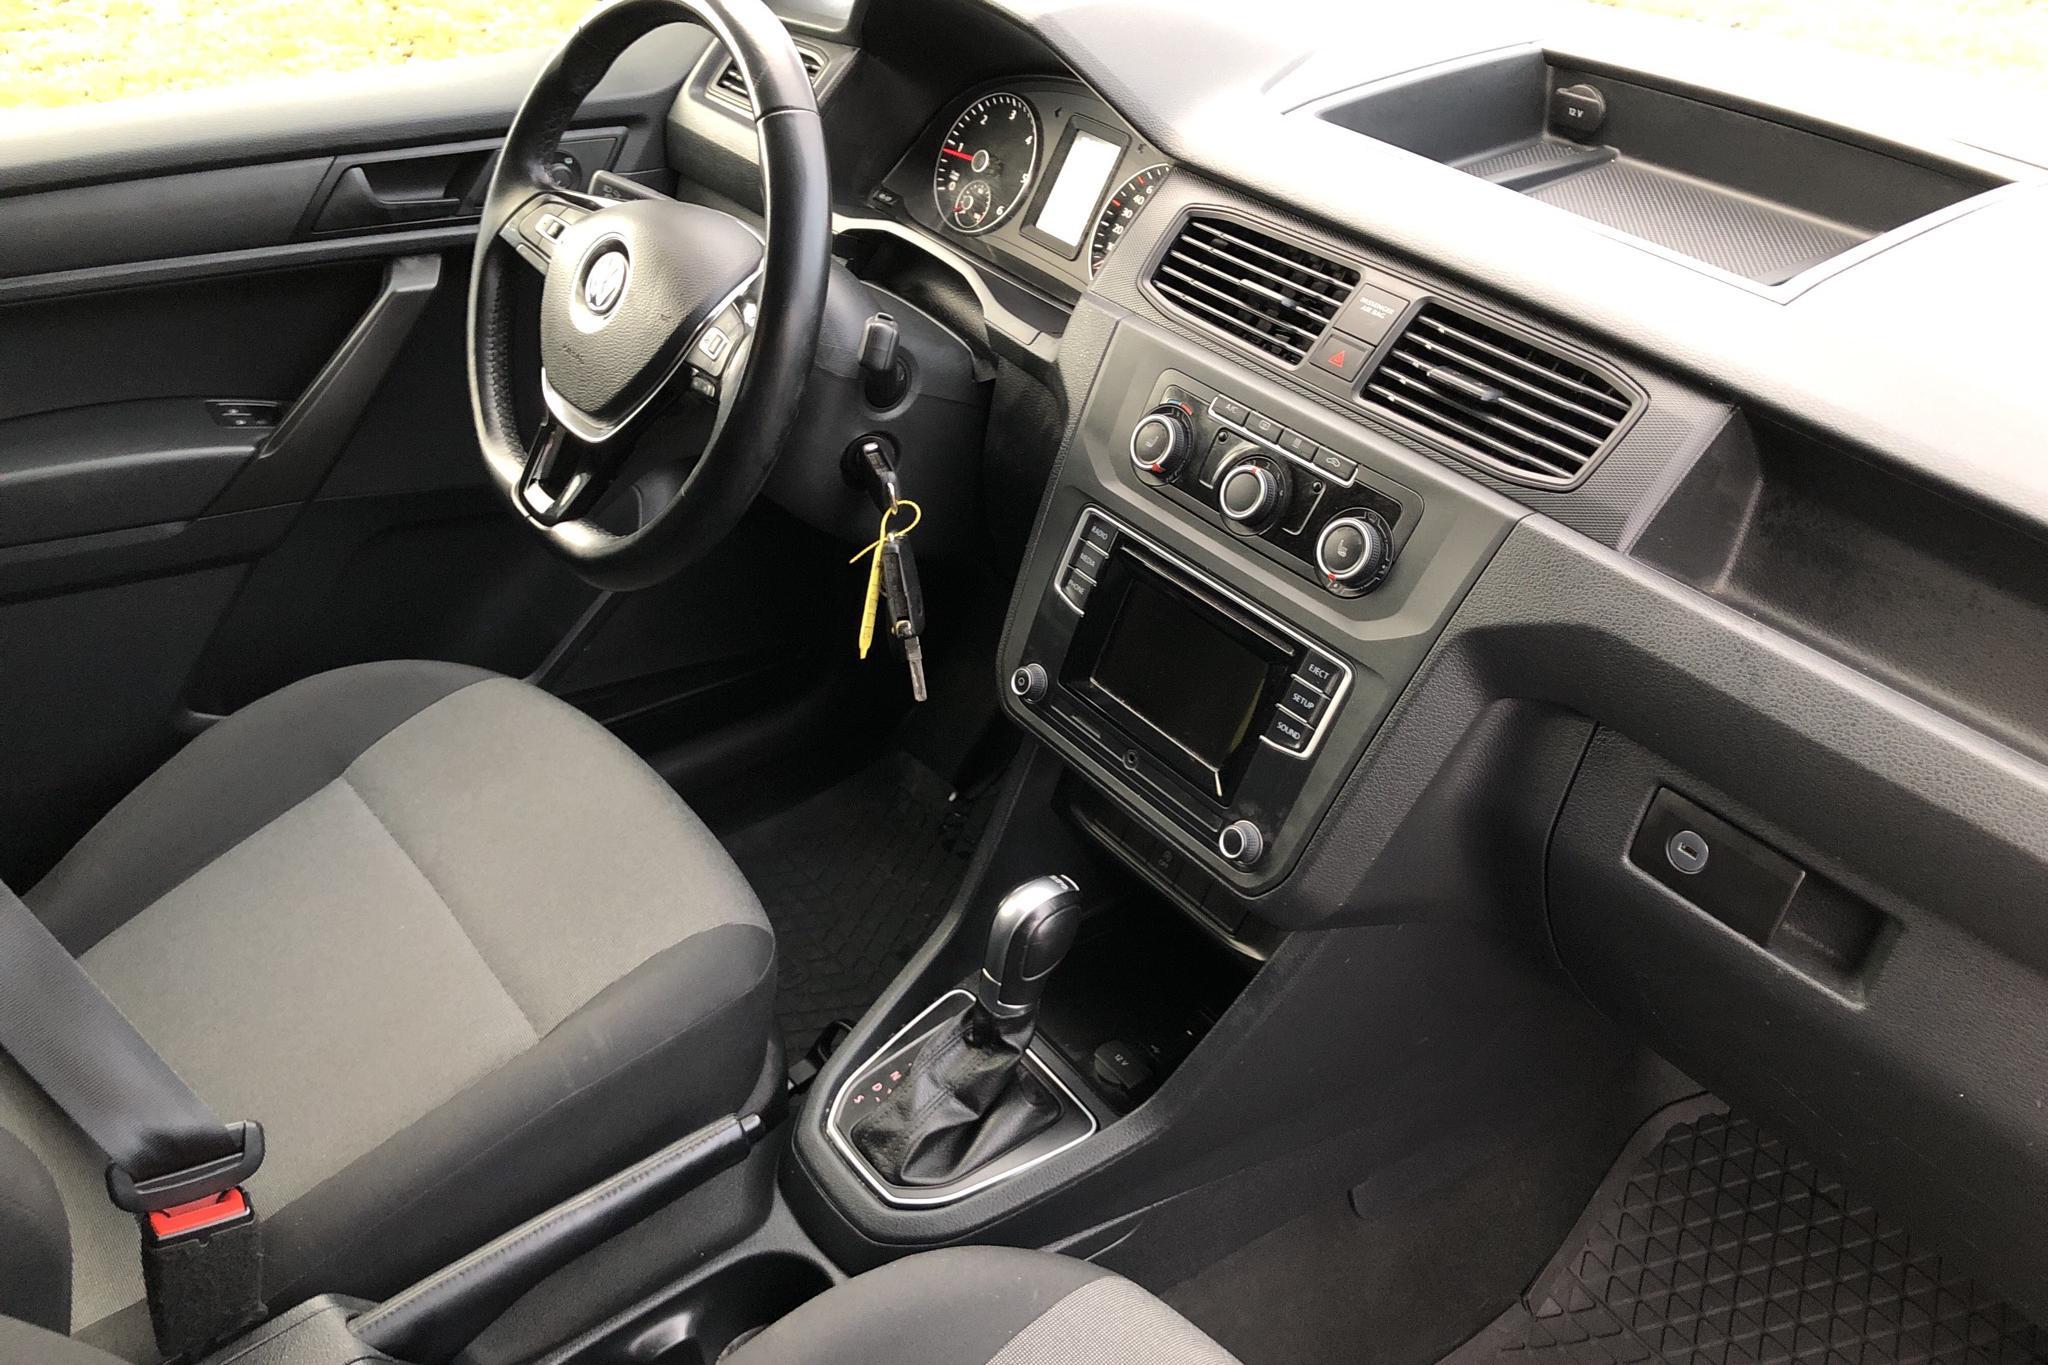 VW Caddy 2.0 TDI Skåp (102hk) - 30 270 km - Automatic - white - 2016